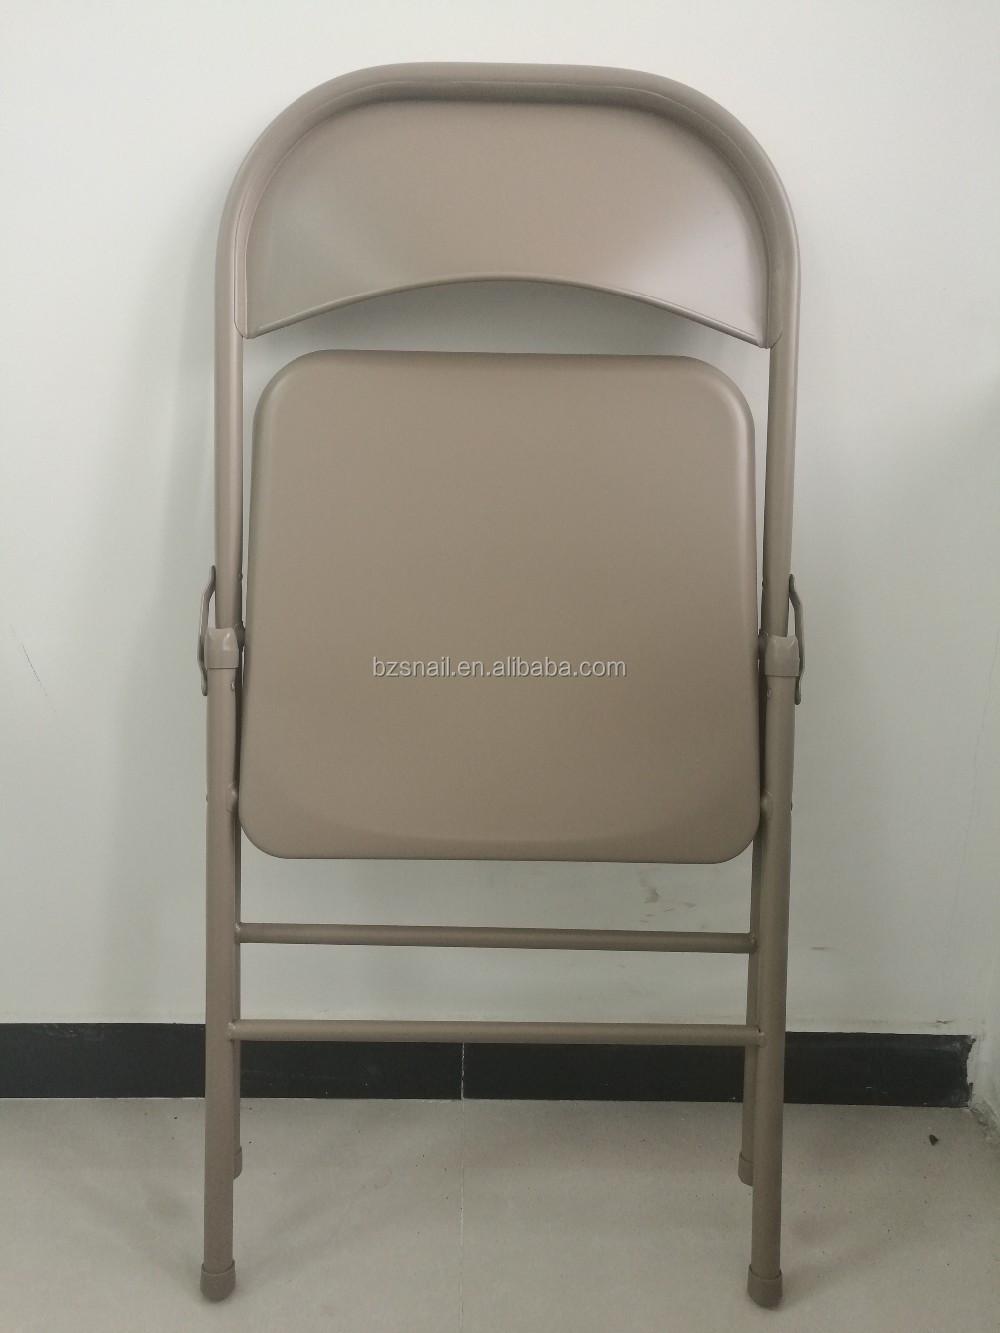 Modern Design Living Room Used All Steel Metal Folding Chair